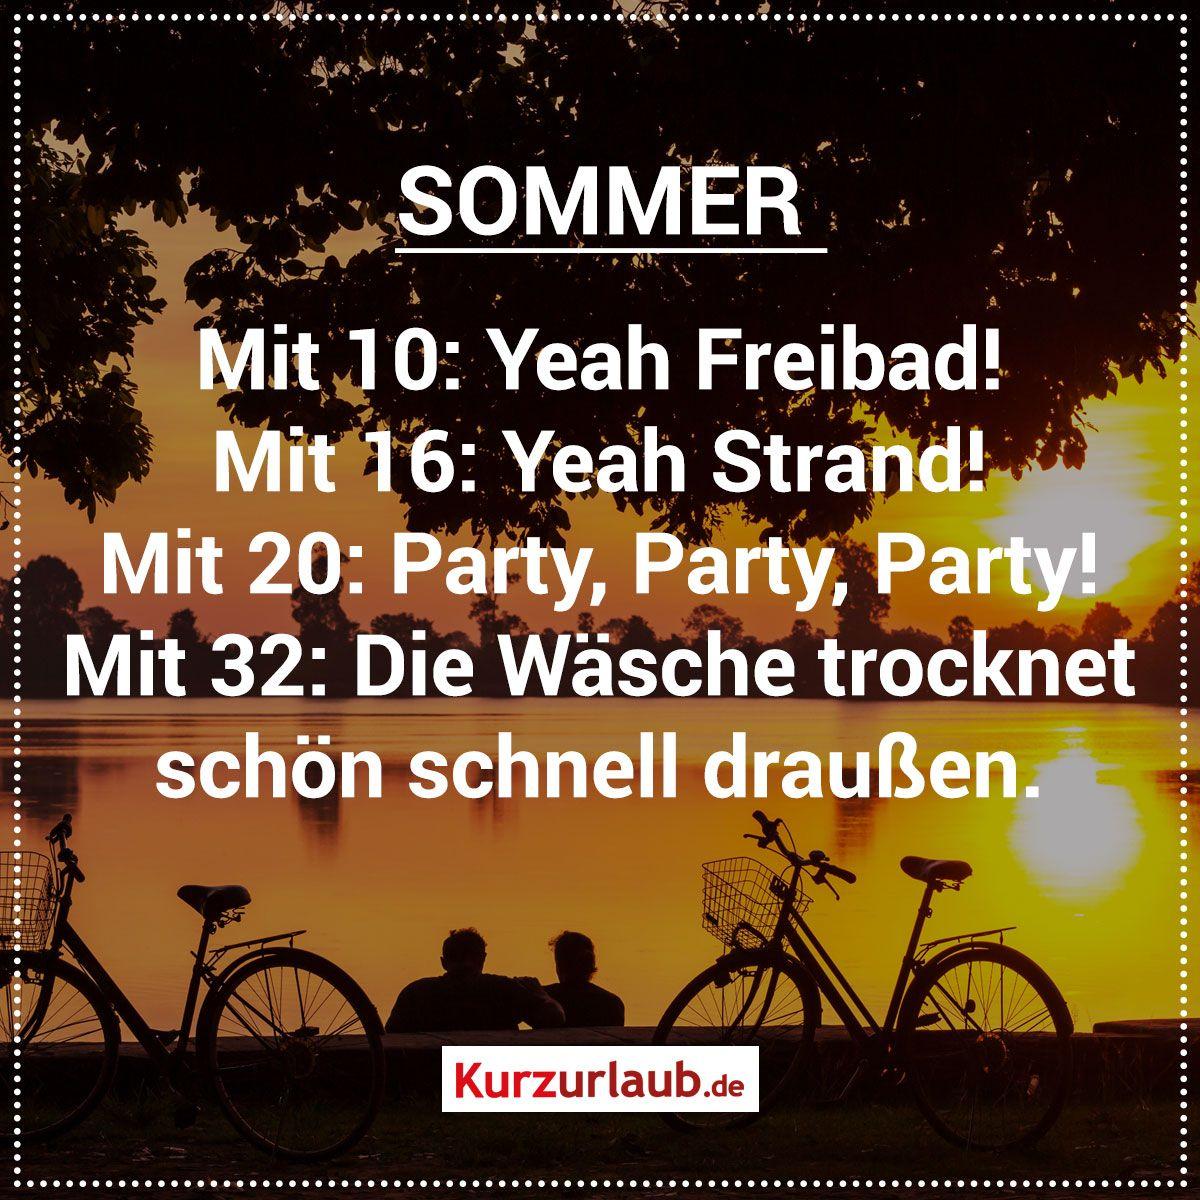 sommer sprüche Sommer Sprüche Reise | Reise Sprüche sommer sprüche